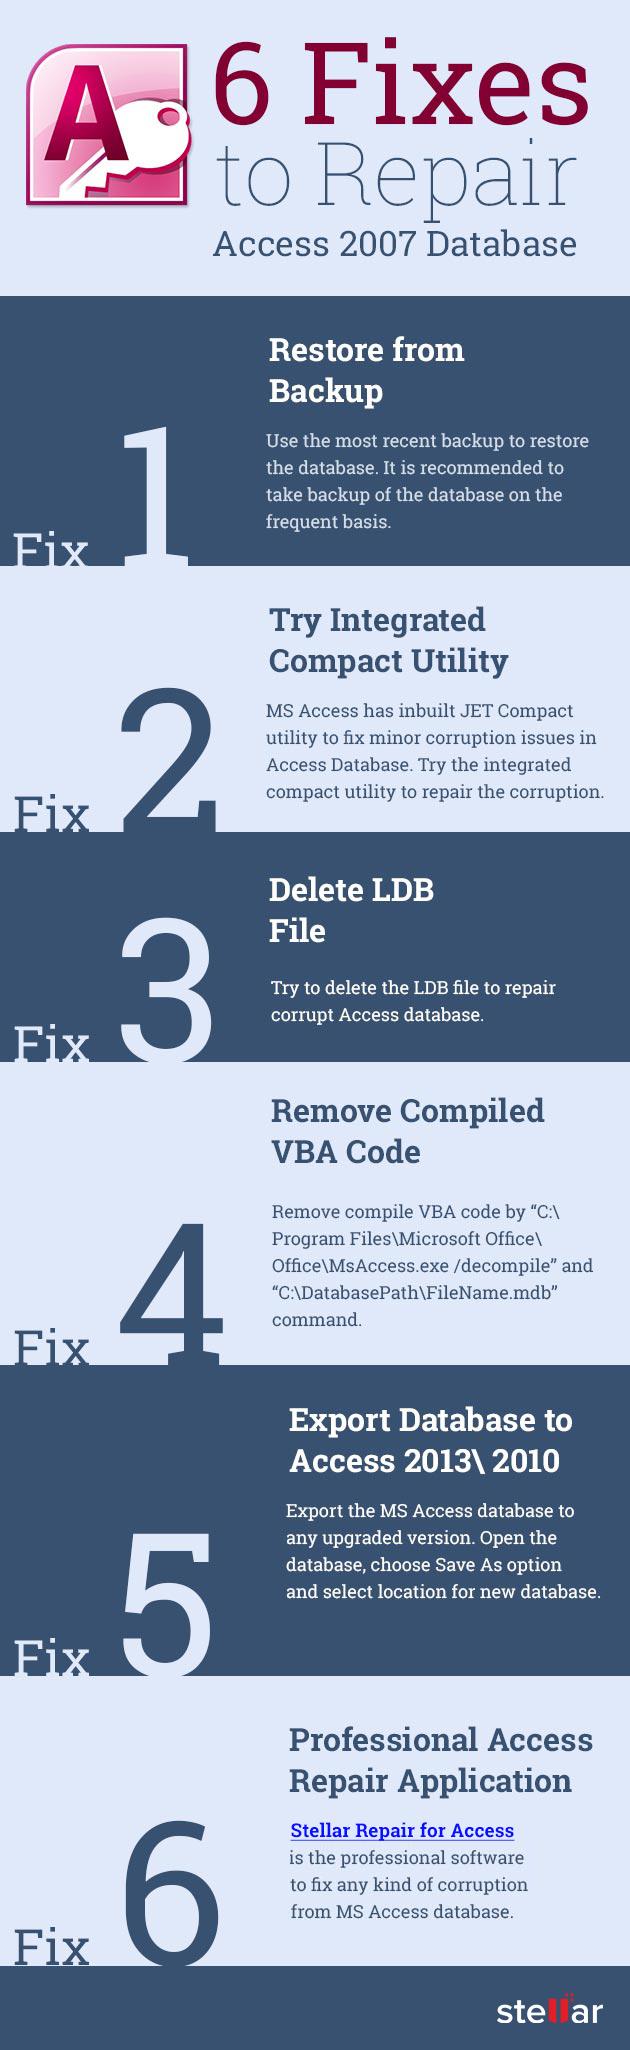 top 6 fixes to repair access database